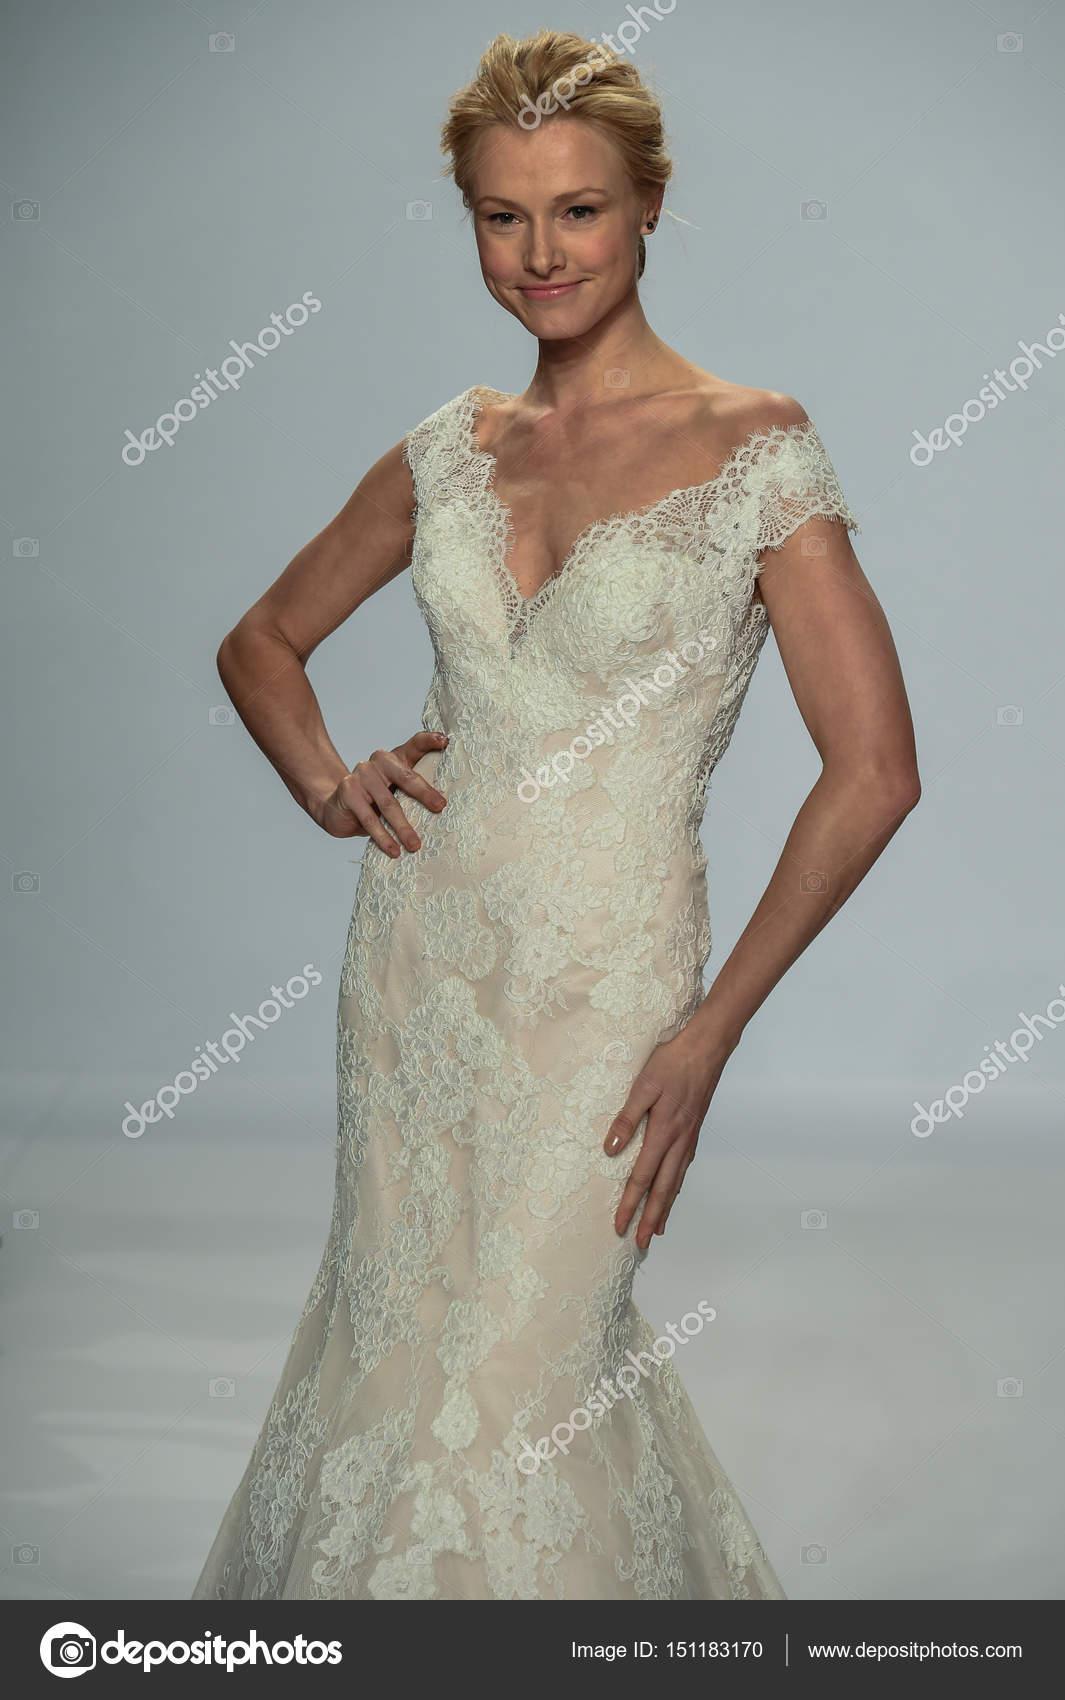 Voir La Randy Fenoli Bridal Photo éditoriale Fashionstock 151183170